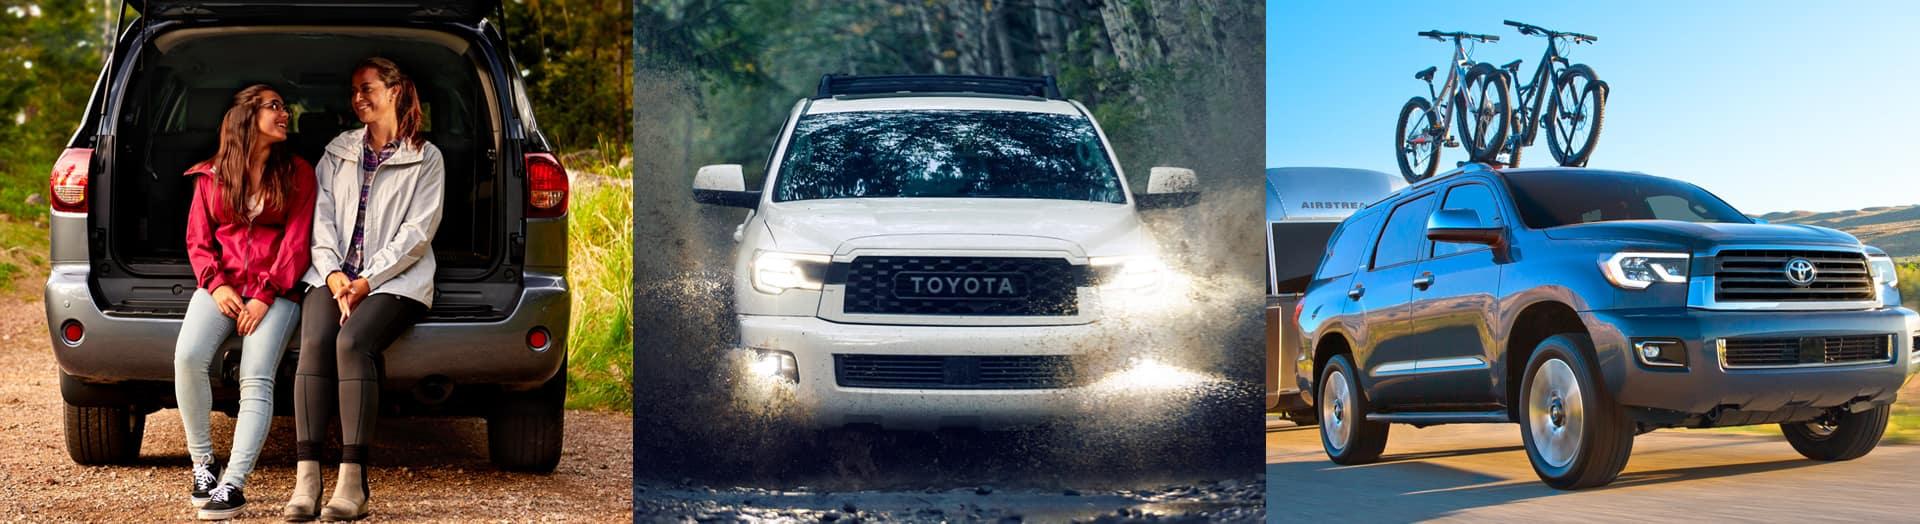 2020 Toyota Sequoia towing capacity